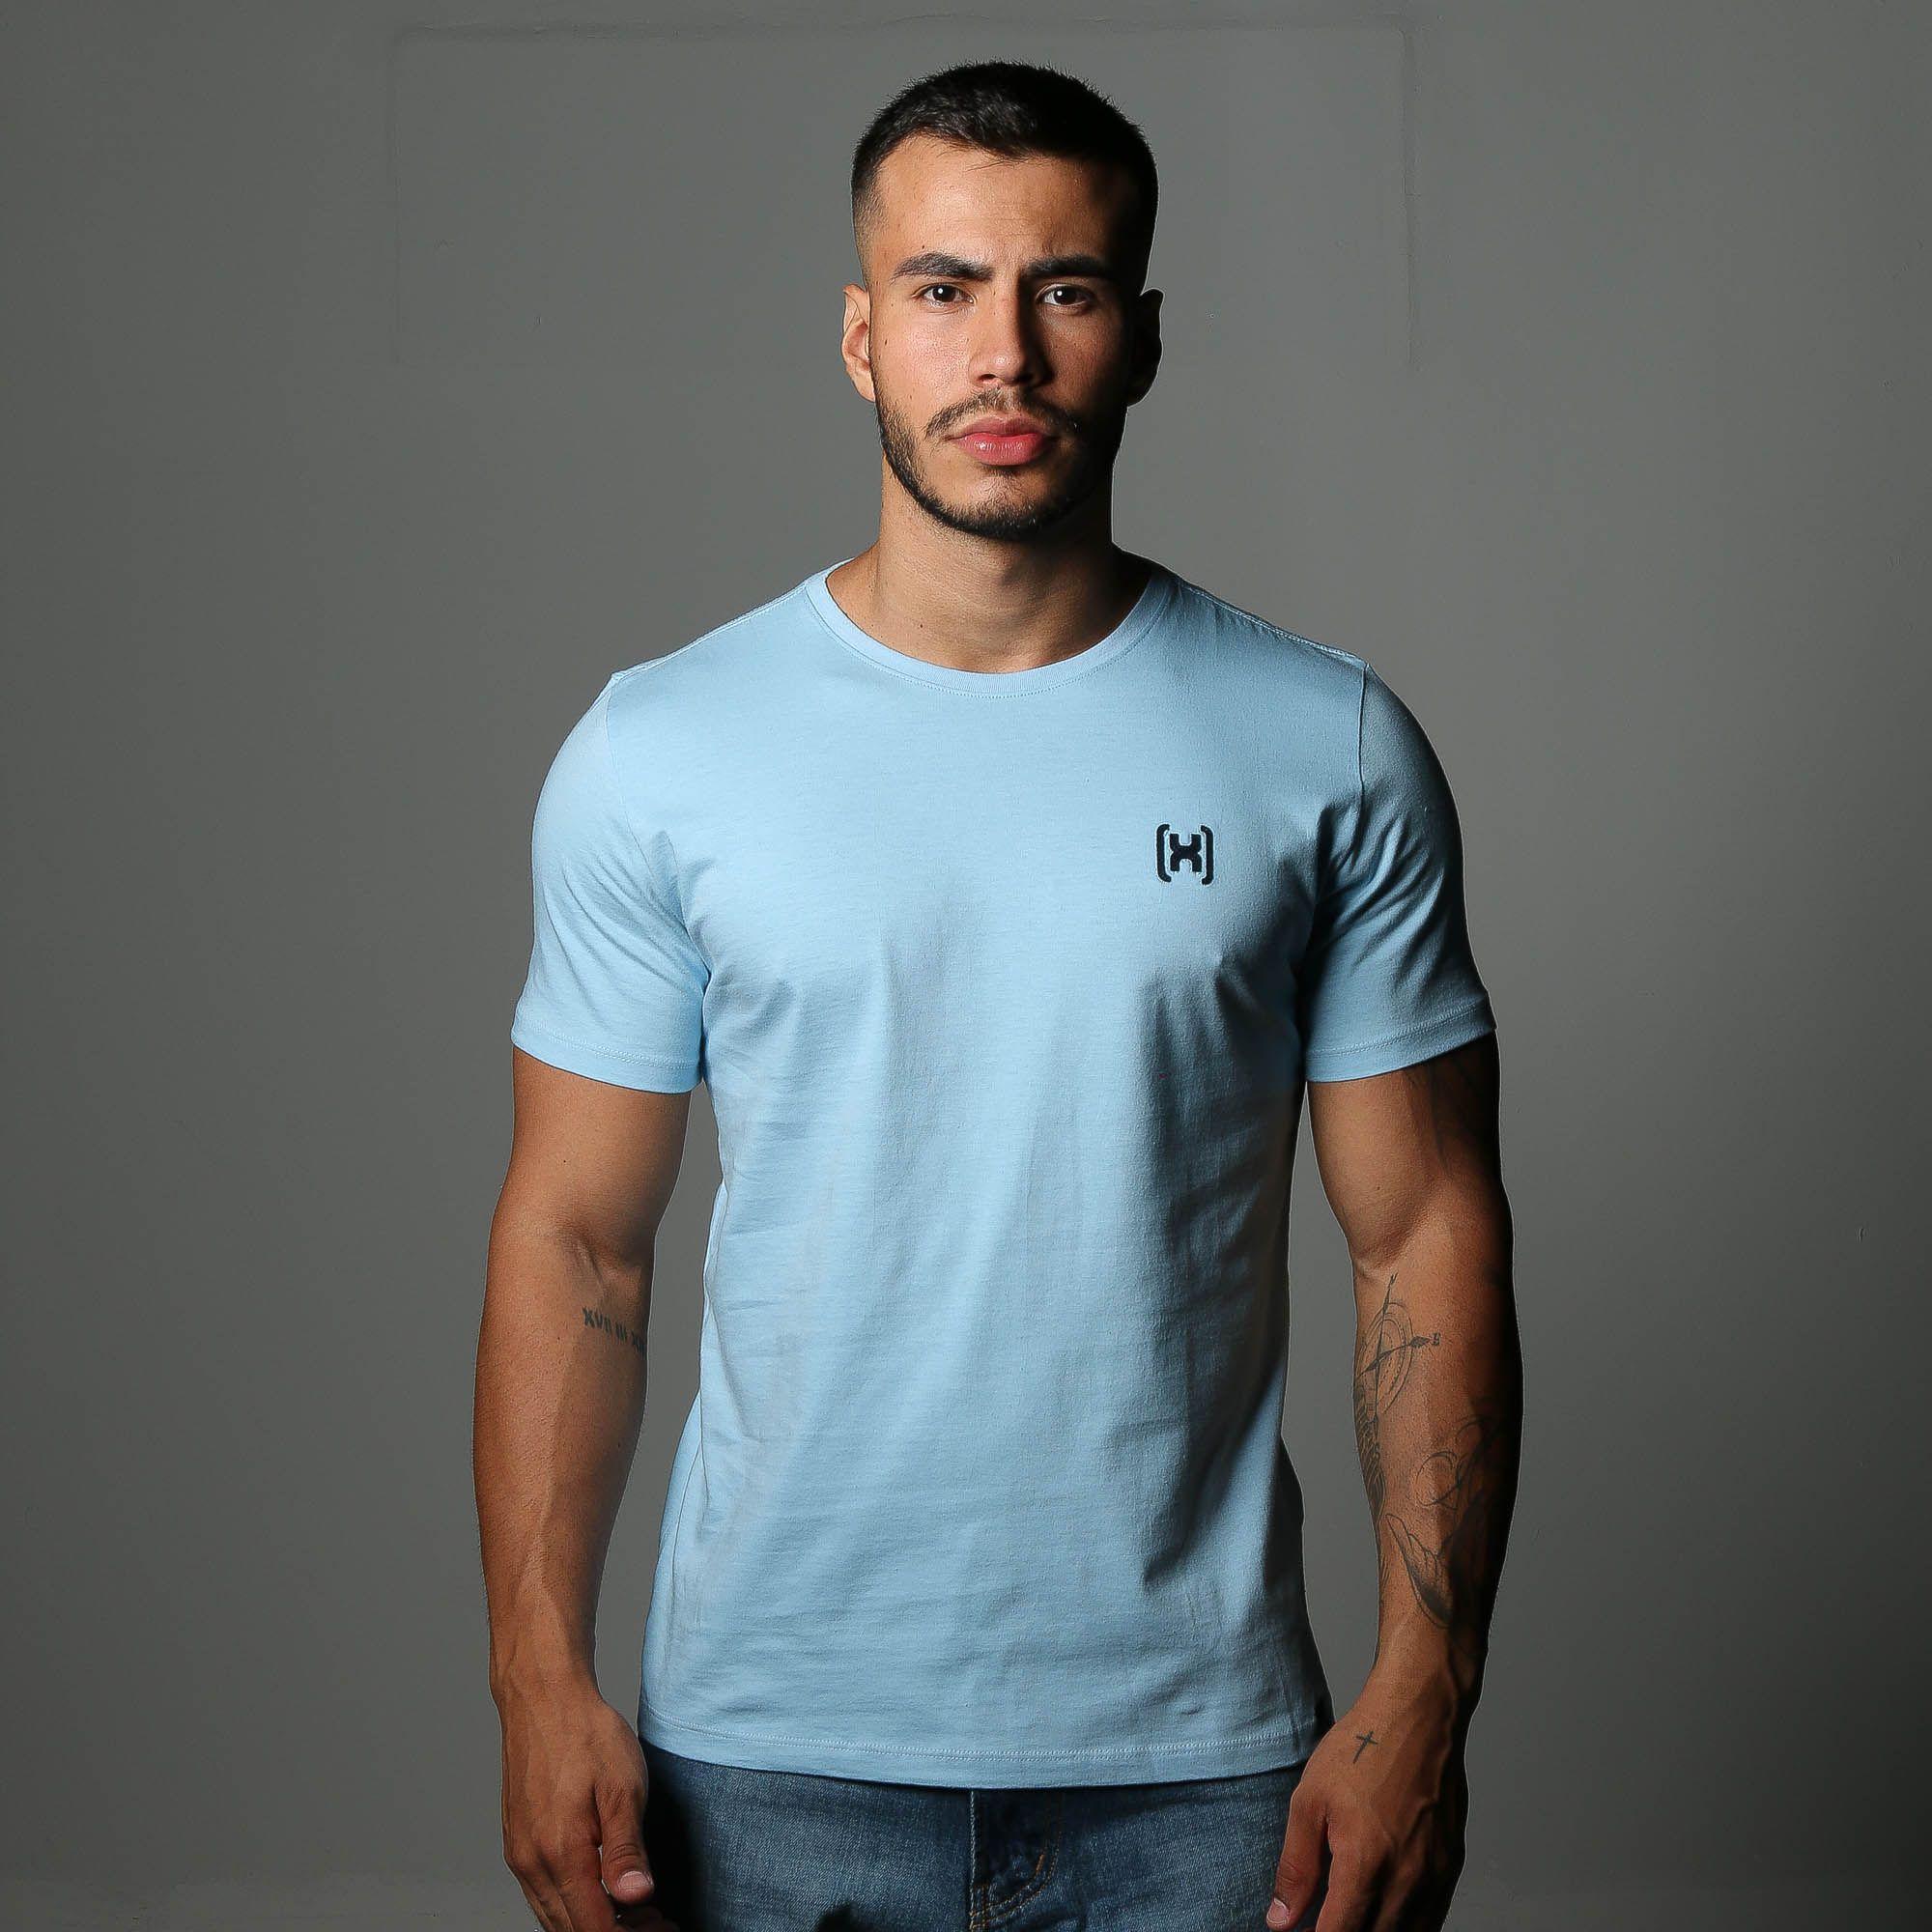 Camiseta Masculina TXC 1799